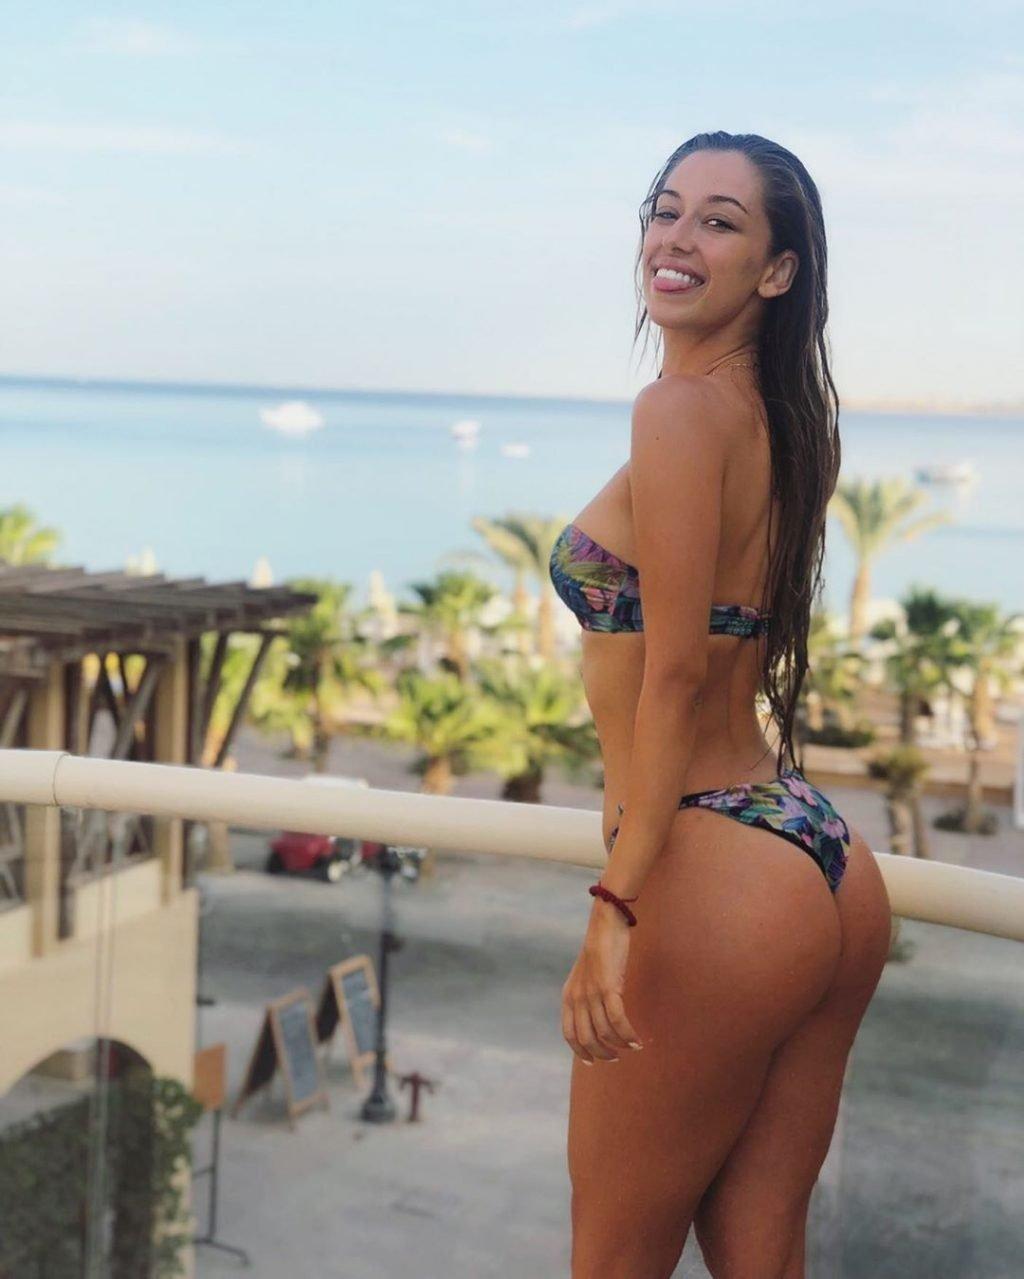 Tea Tairović Nude Leaked The Fappening (30 Photos)